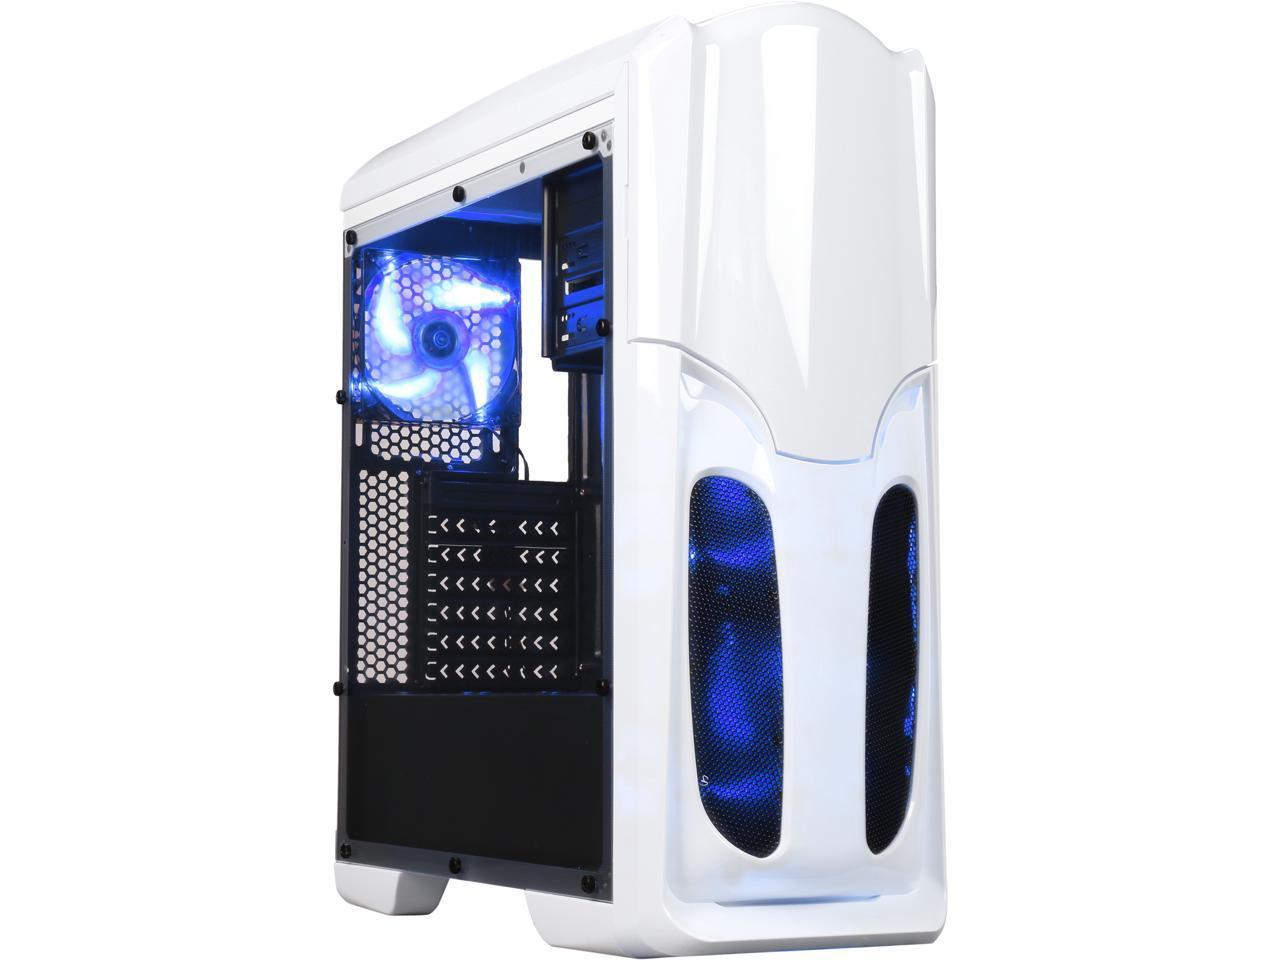 DIYPC USB 3.0 ATX Mid Tower Gaming Computer Case (White)